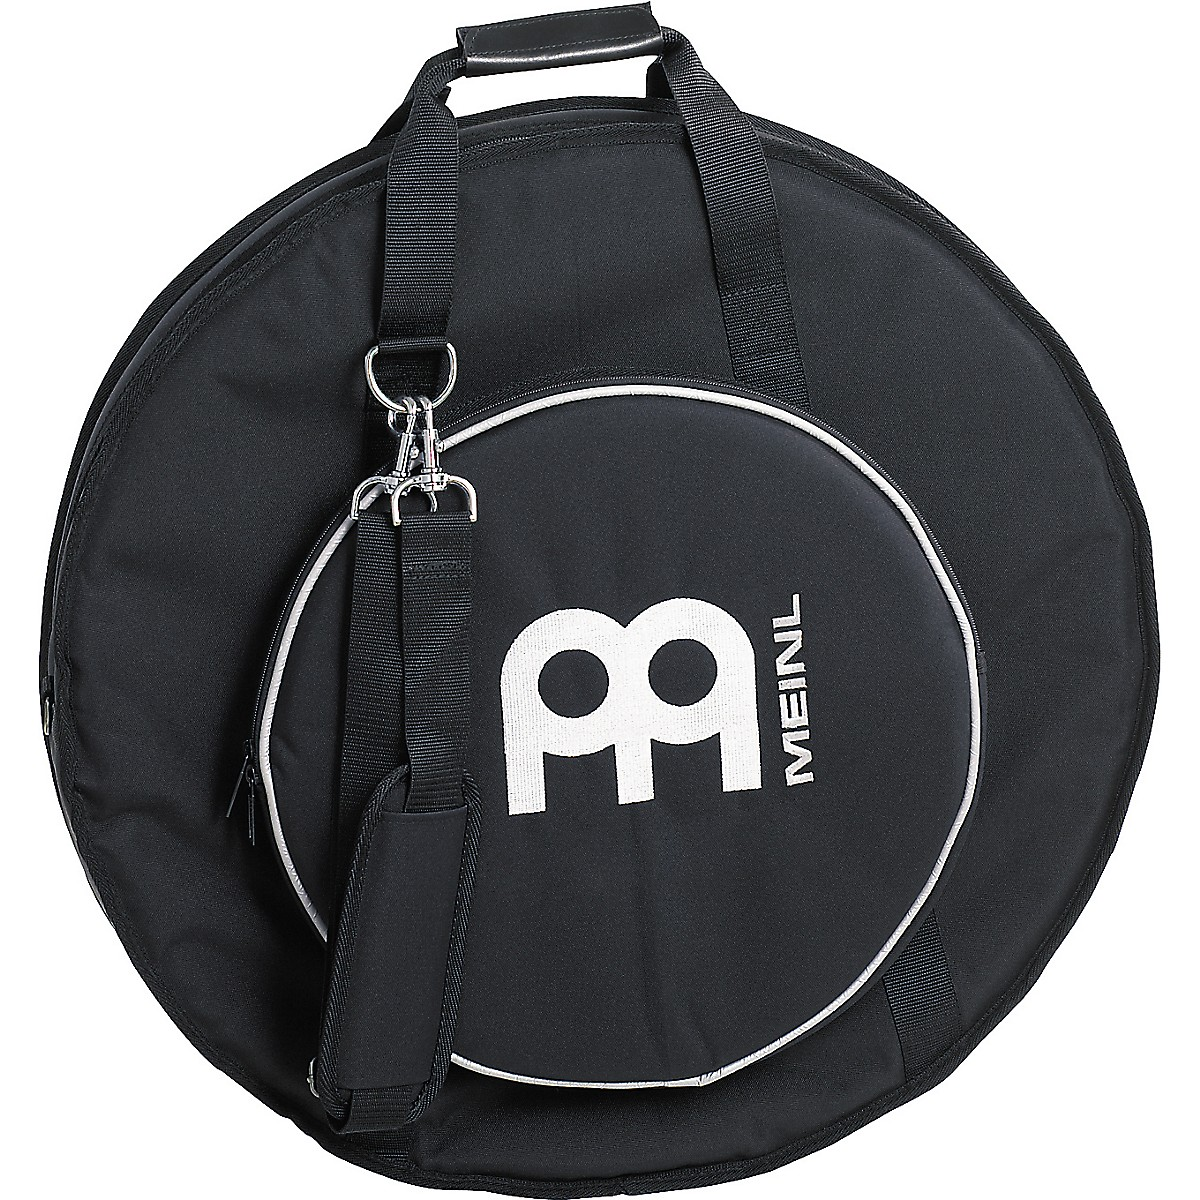 Meinl Professional Cymbal Bag